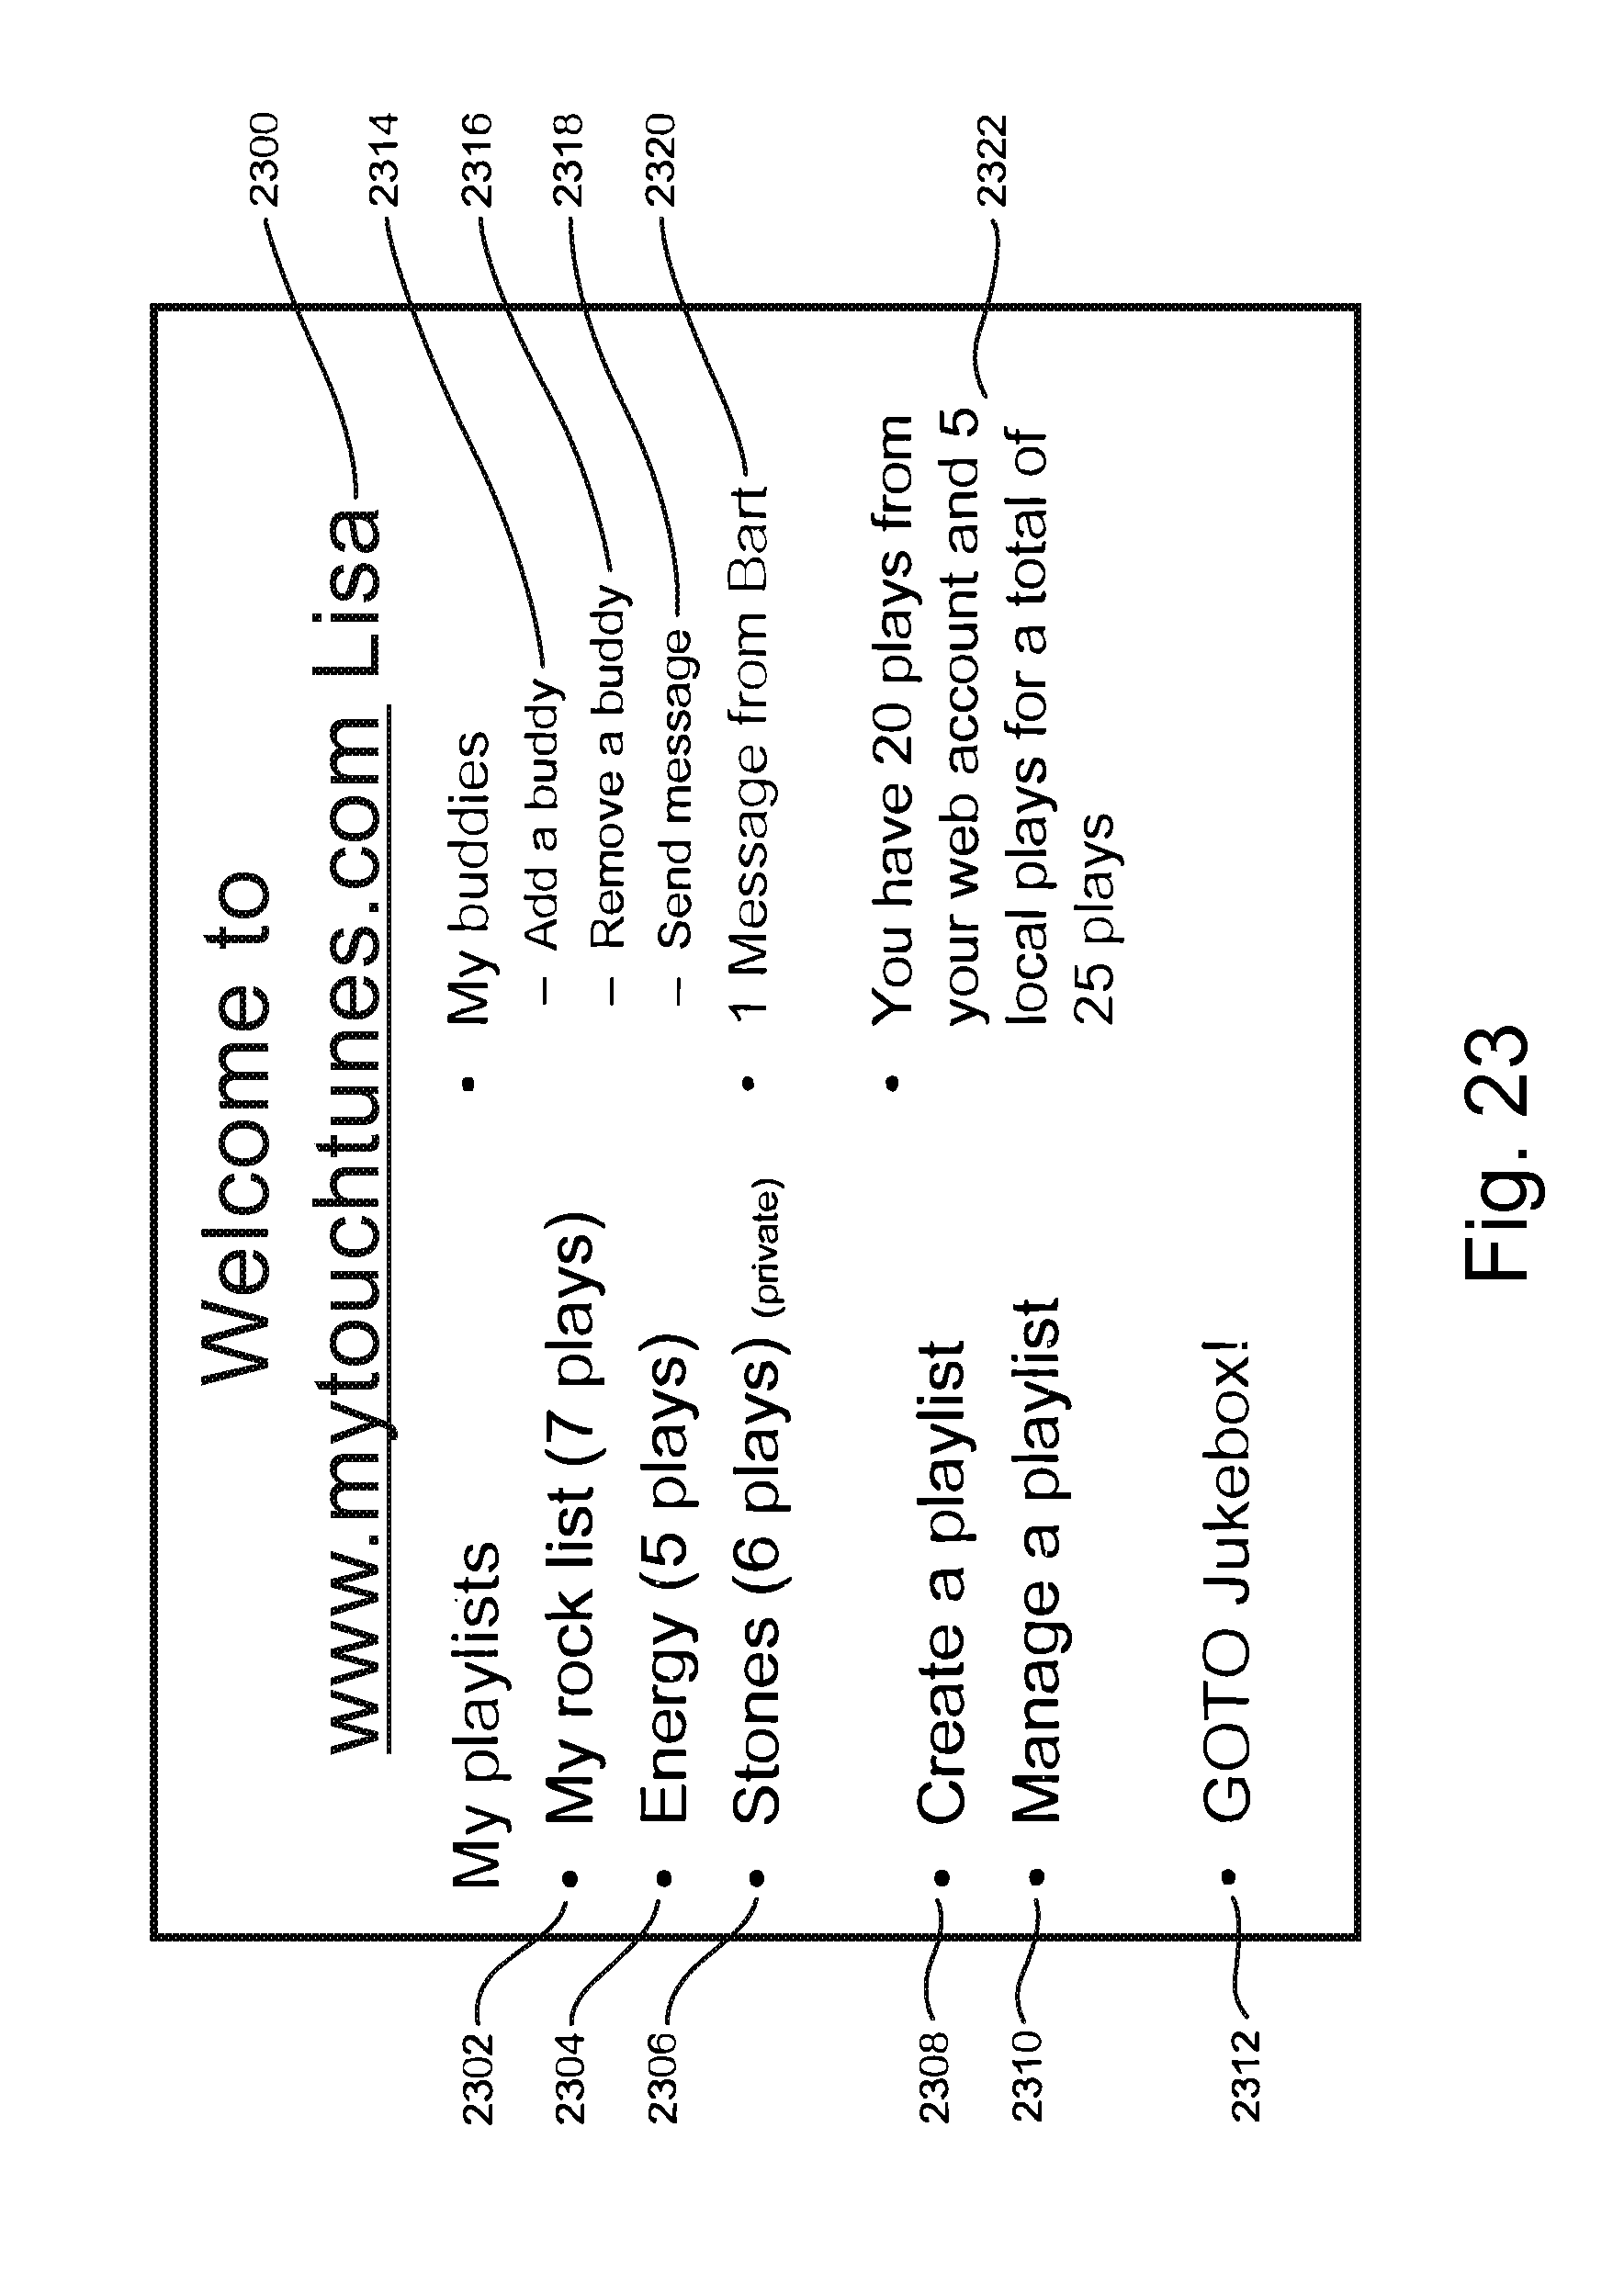 Patent US 9,430,797 B2